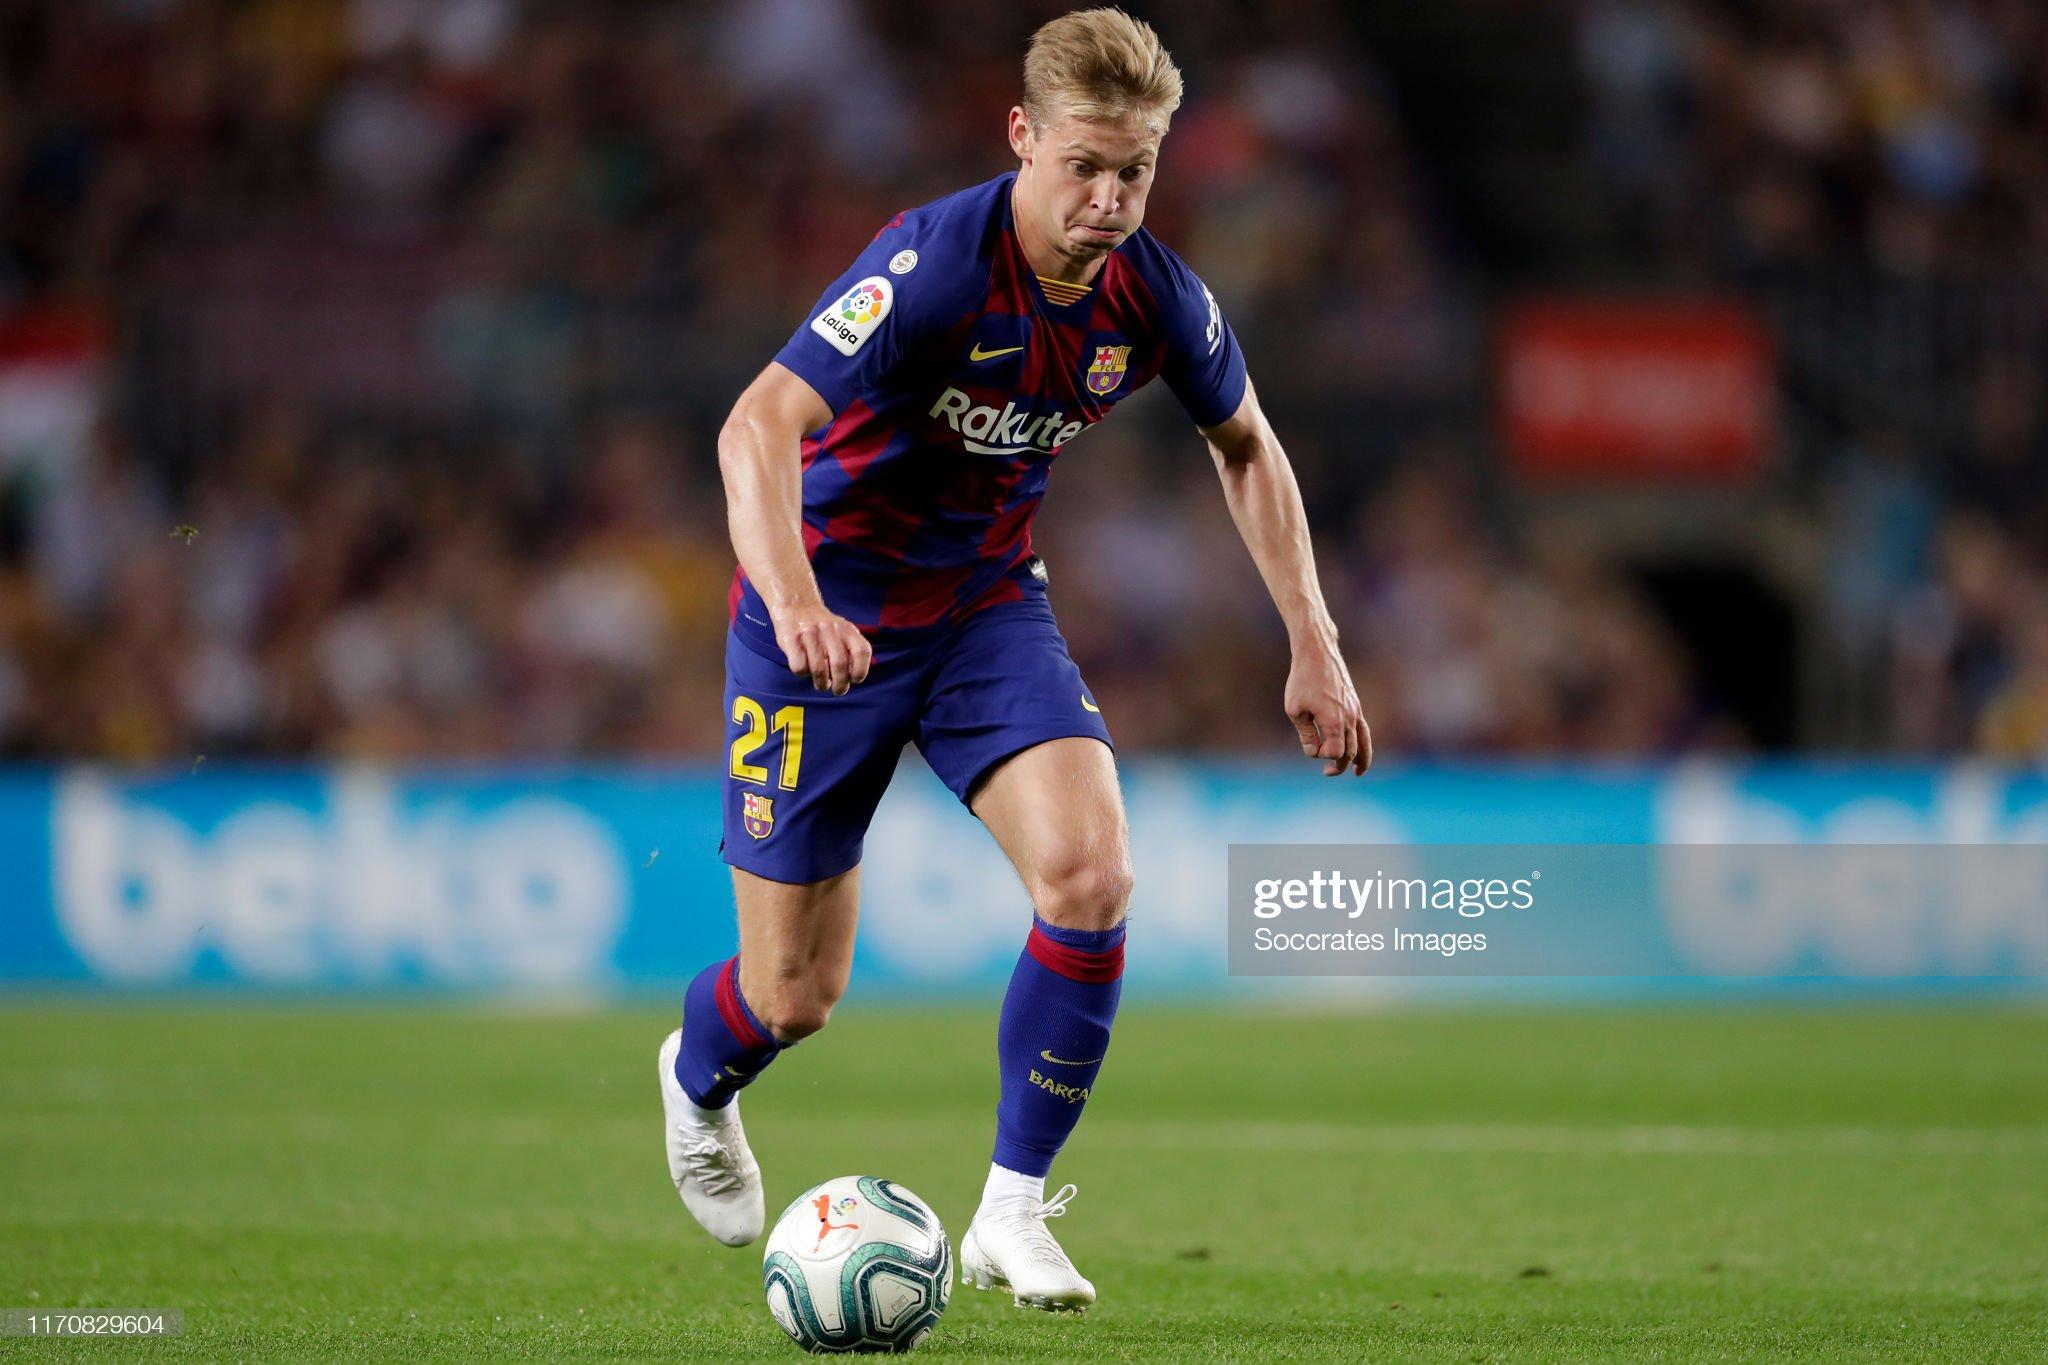 صور مباراة : برشلونة - فياريال 2-1 ( 24-09-2019 )  Frenkie-de-jong-of-fc-barcelona-during-the-la-liga-santander-match-picture-id1170829604?s=2048x2048